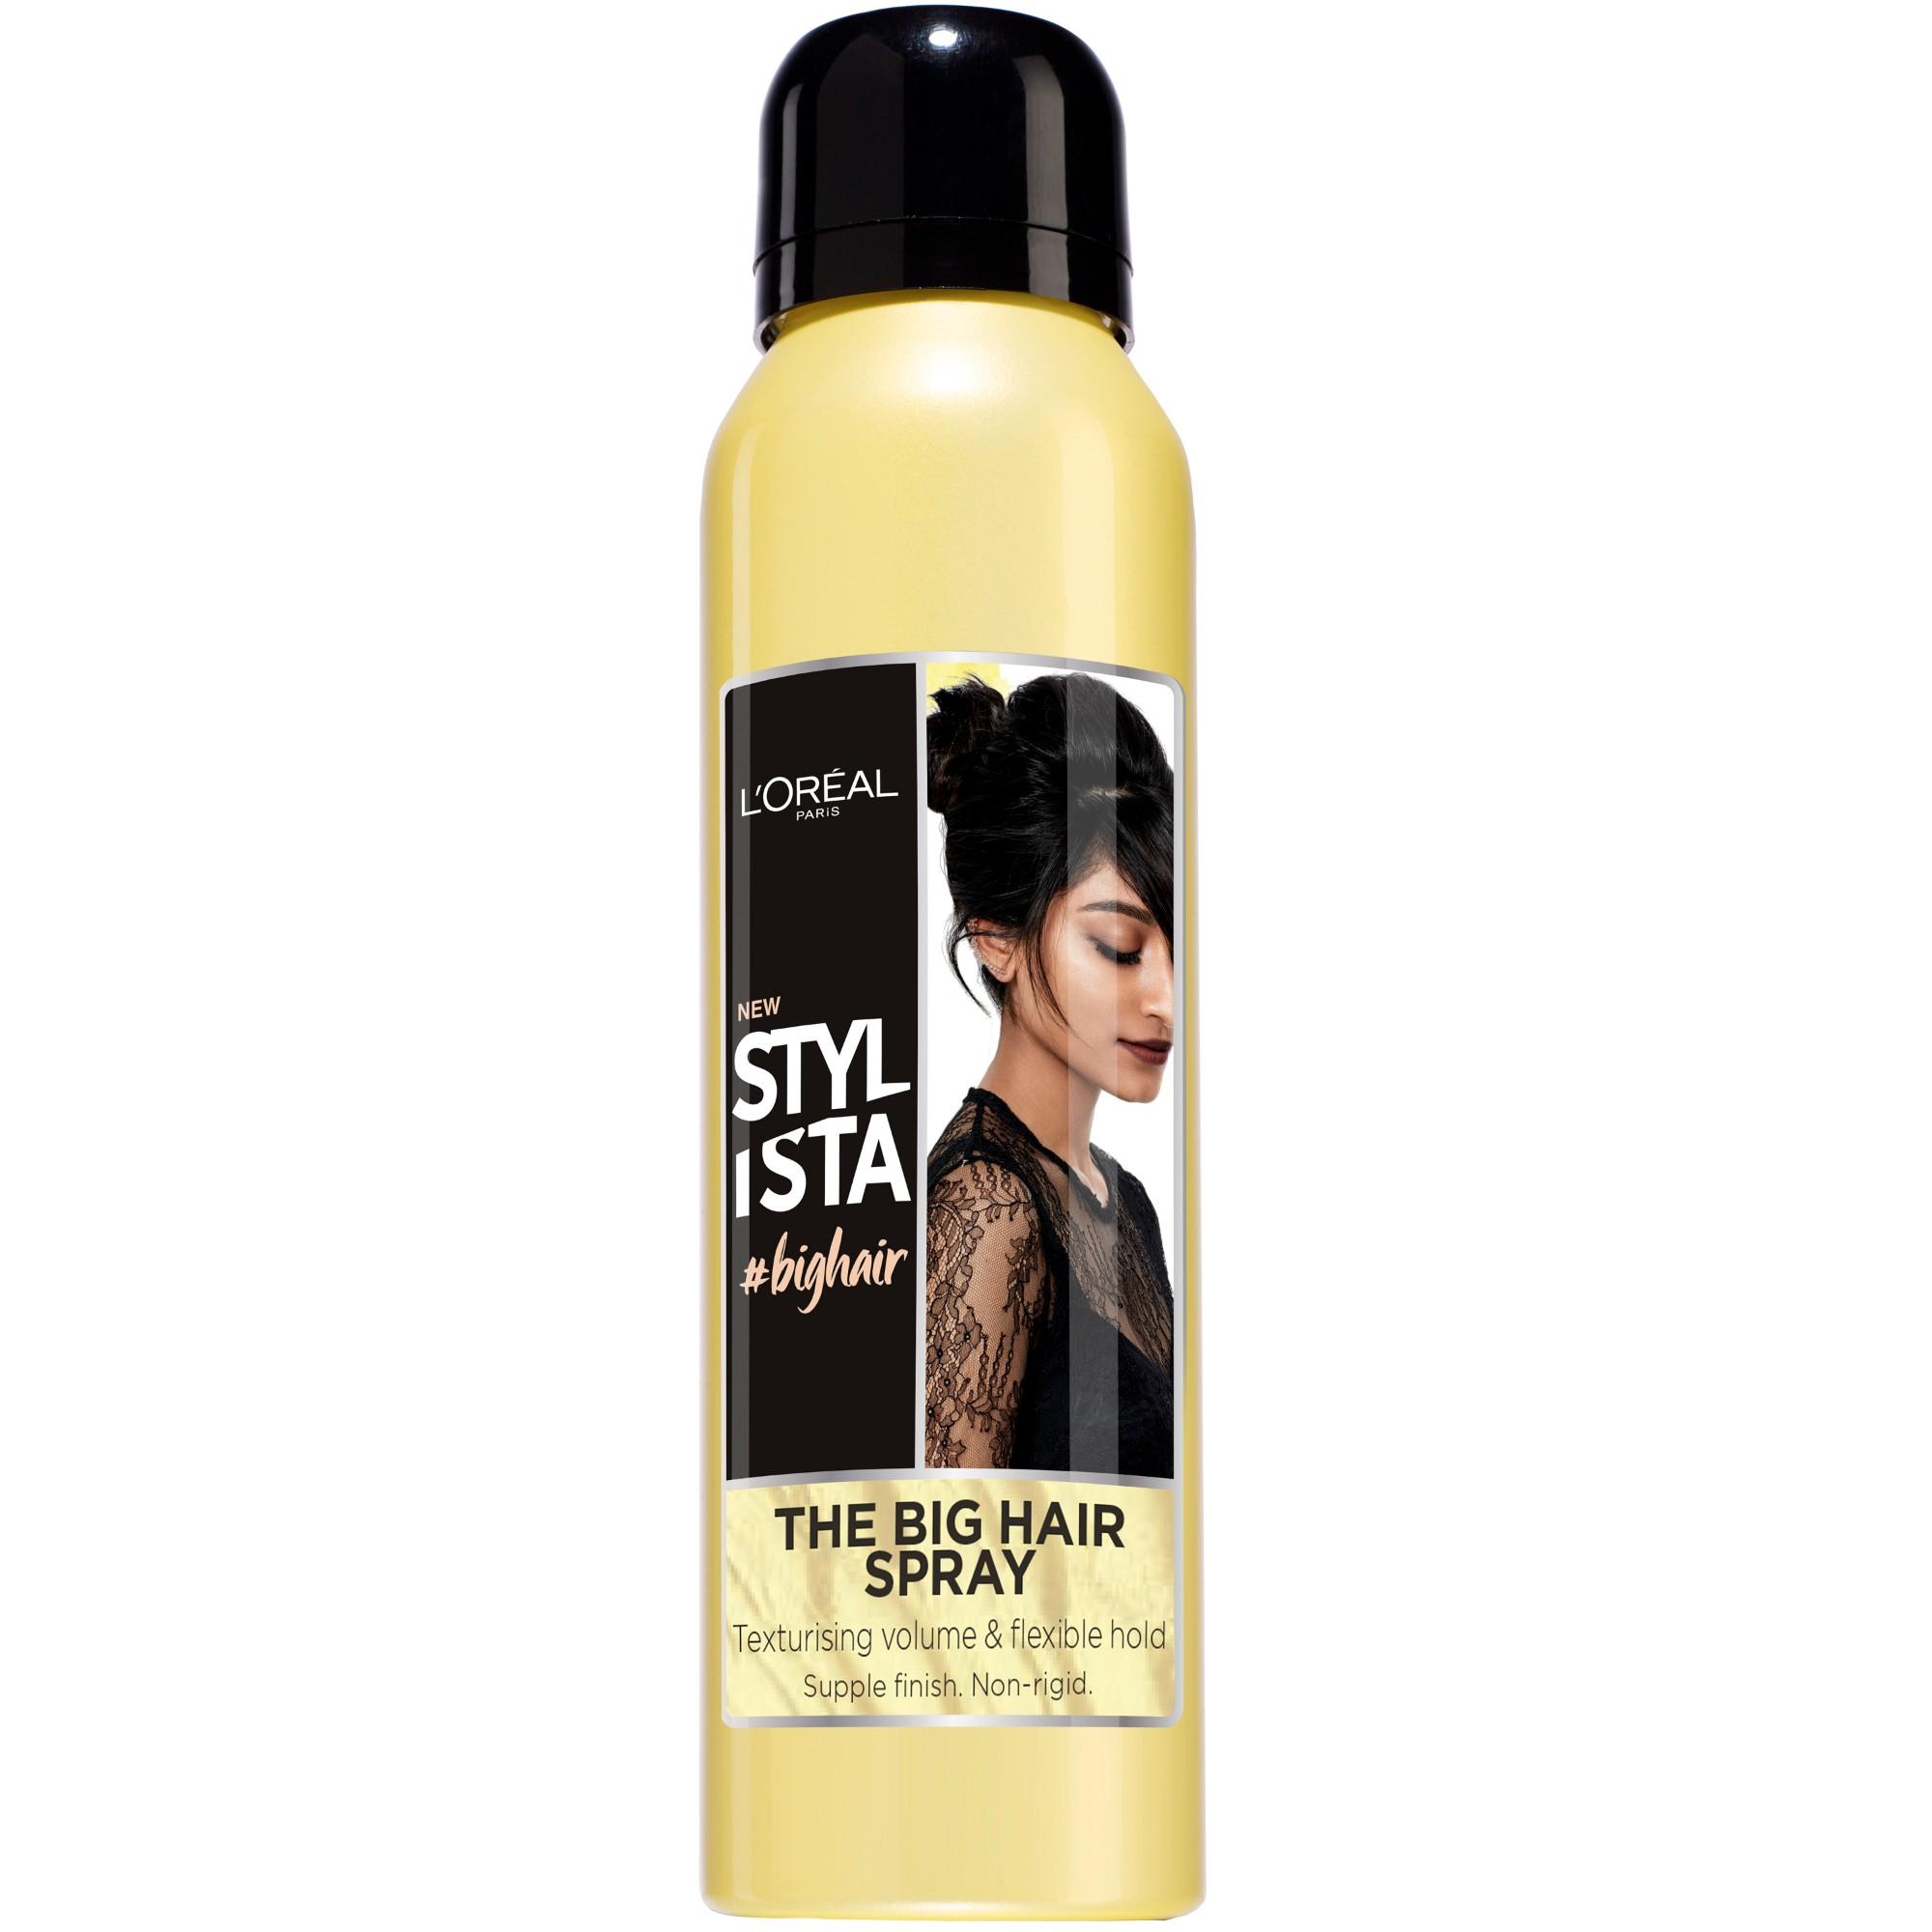 Stylista Bighair Spray